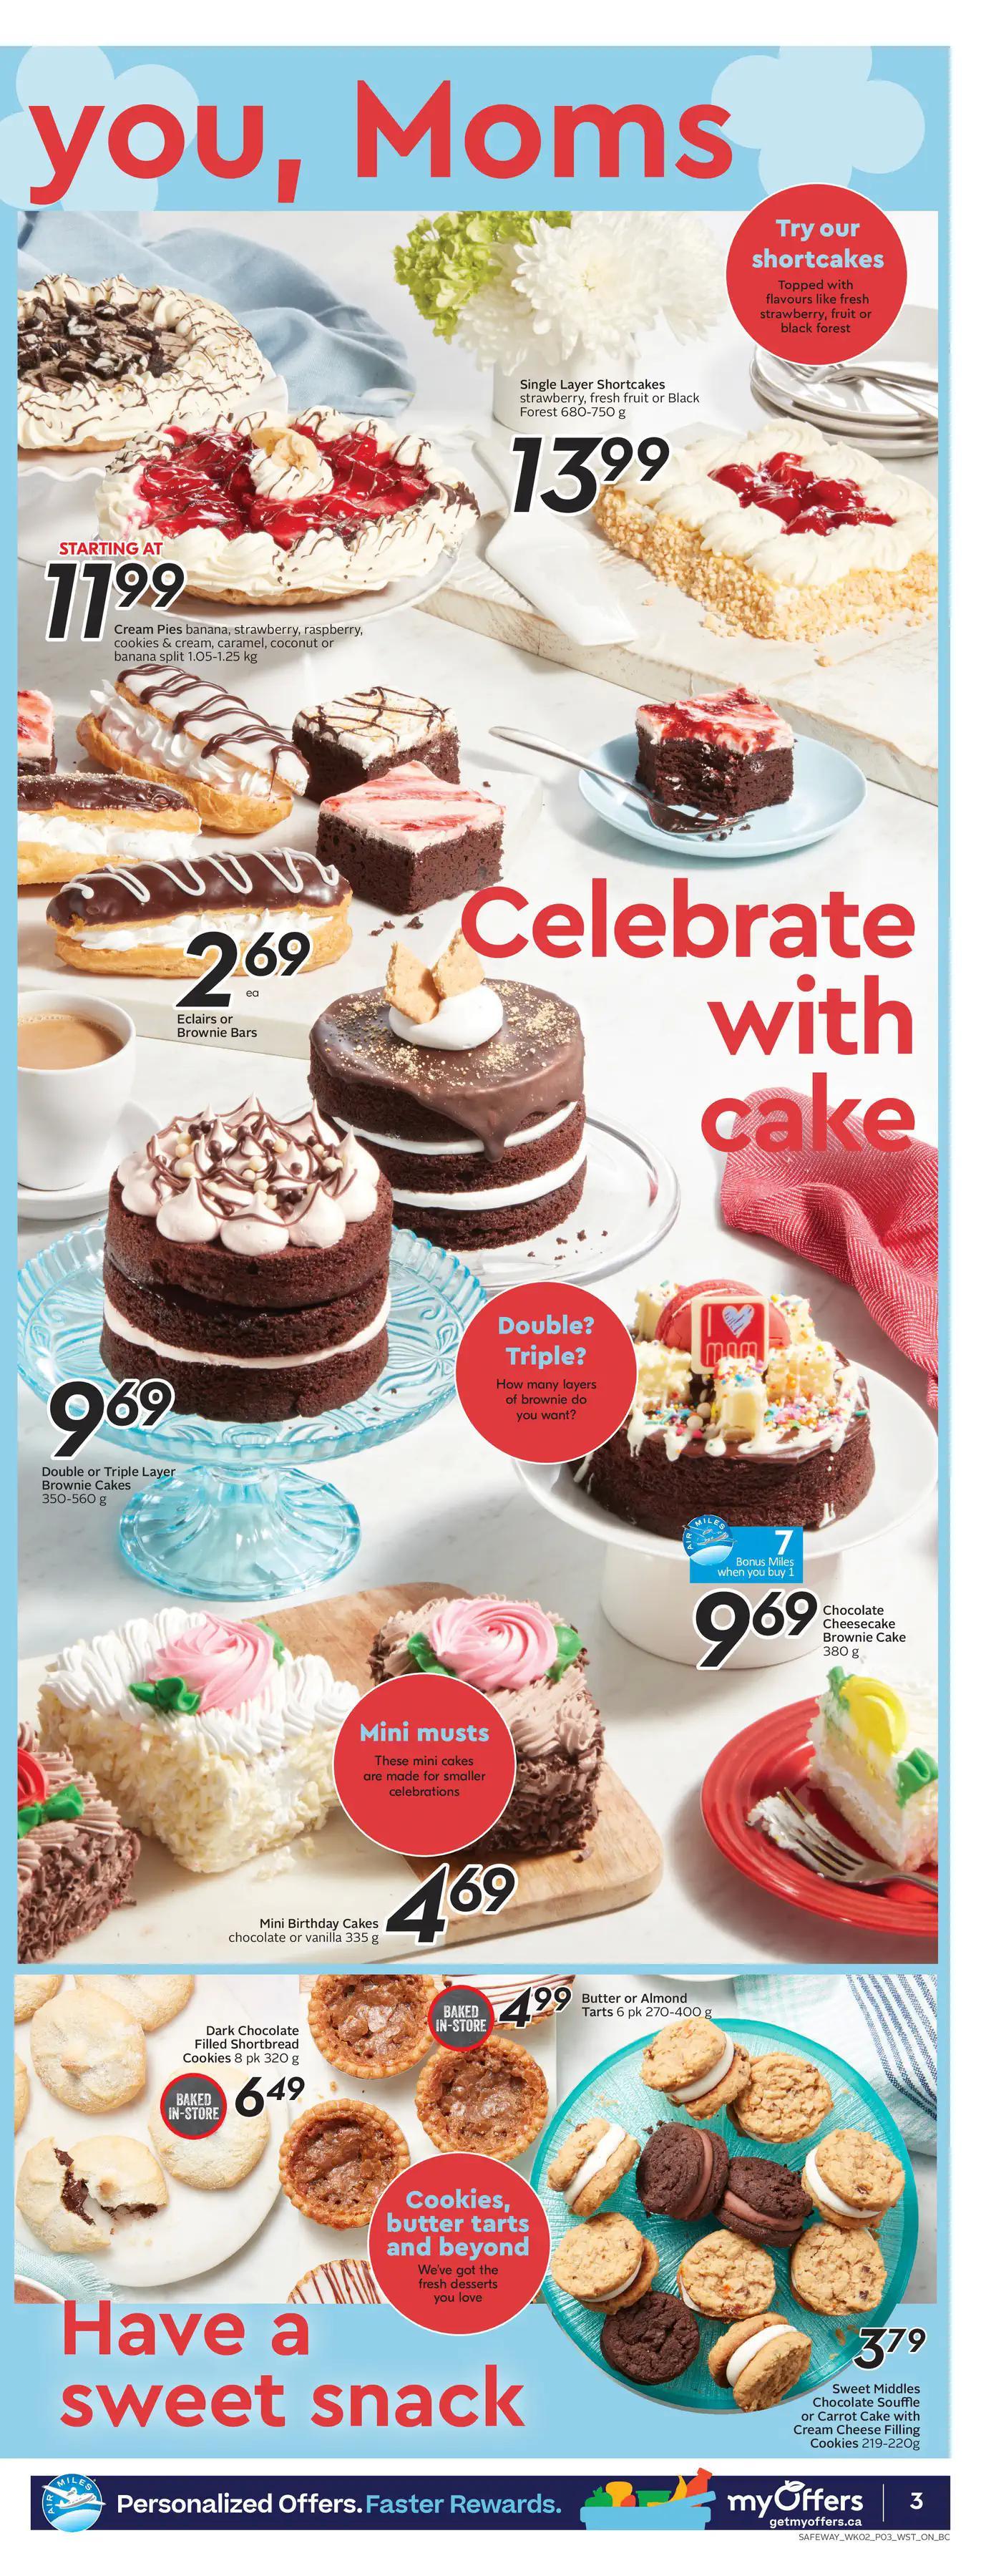 Safeway - Weekly Flyer Specials - Page 4